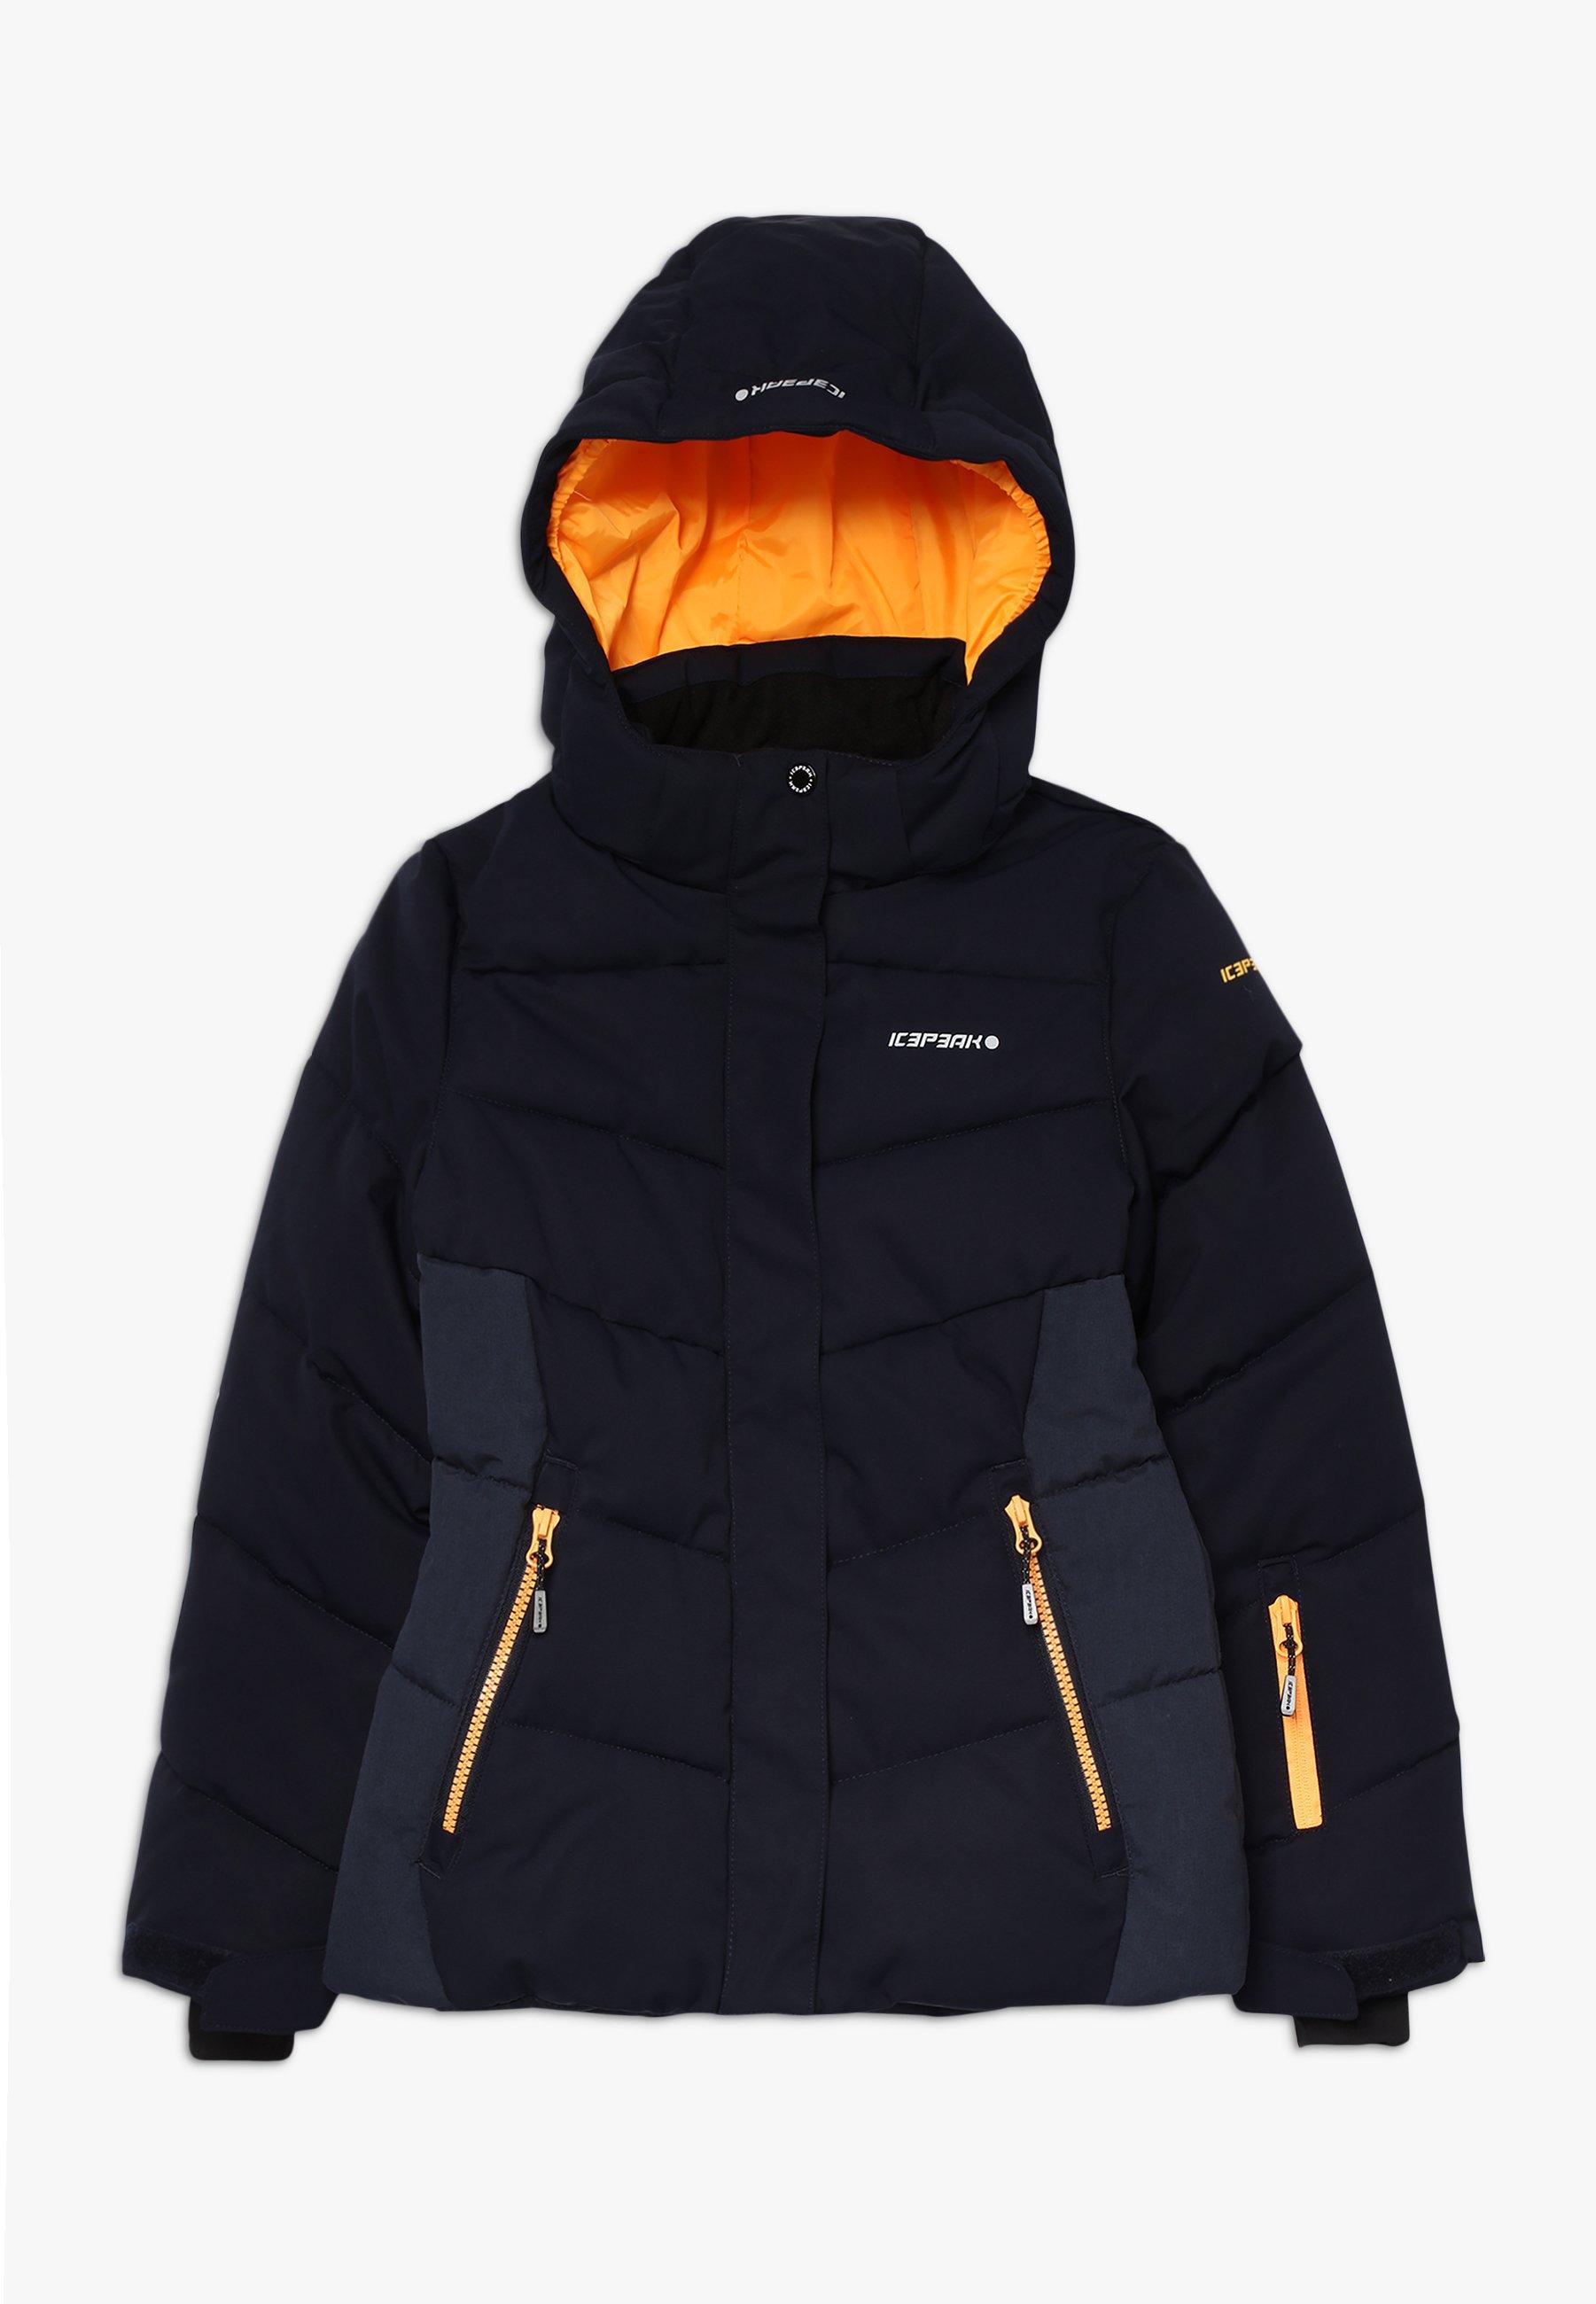 Icepeak LILLE Ski jas navy bluedonkerblauw Zalando.nl